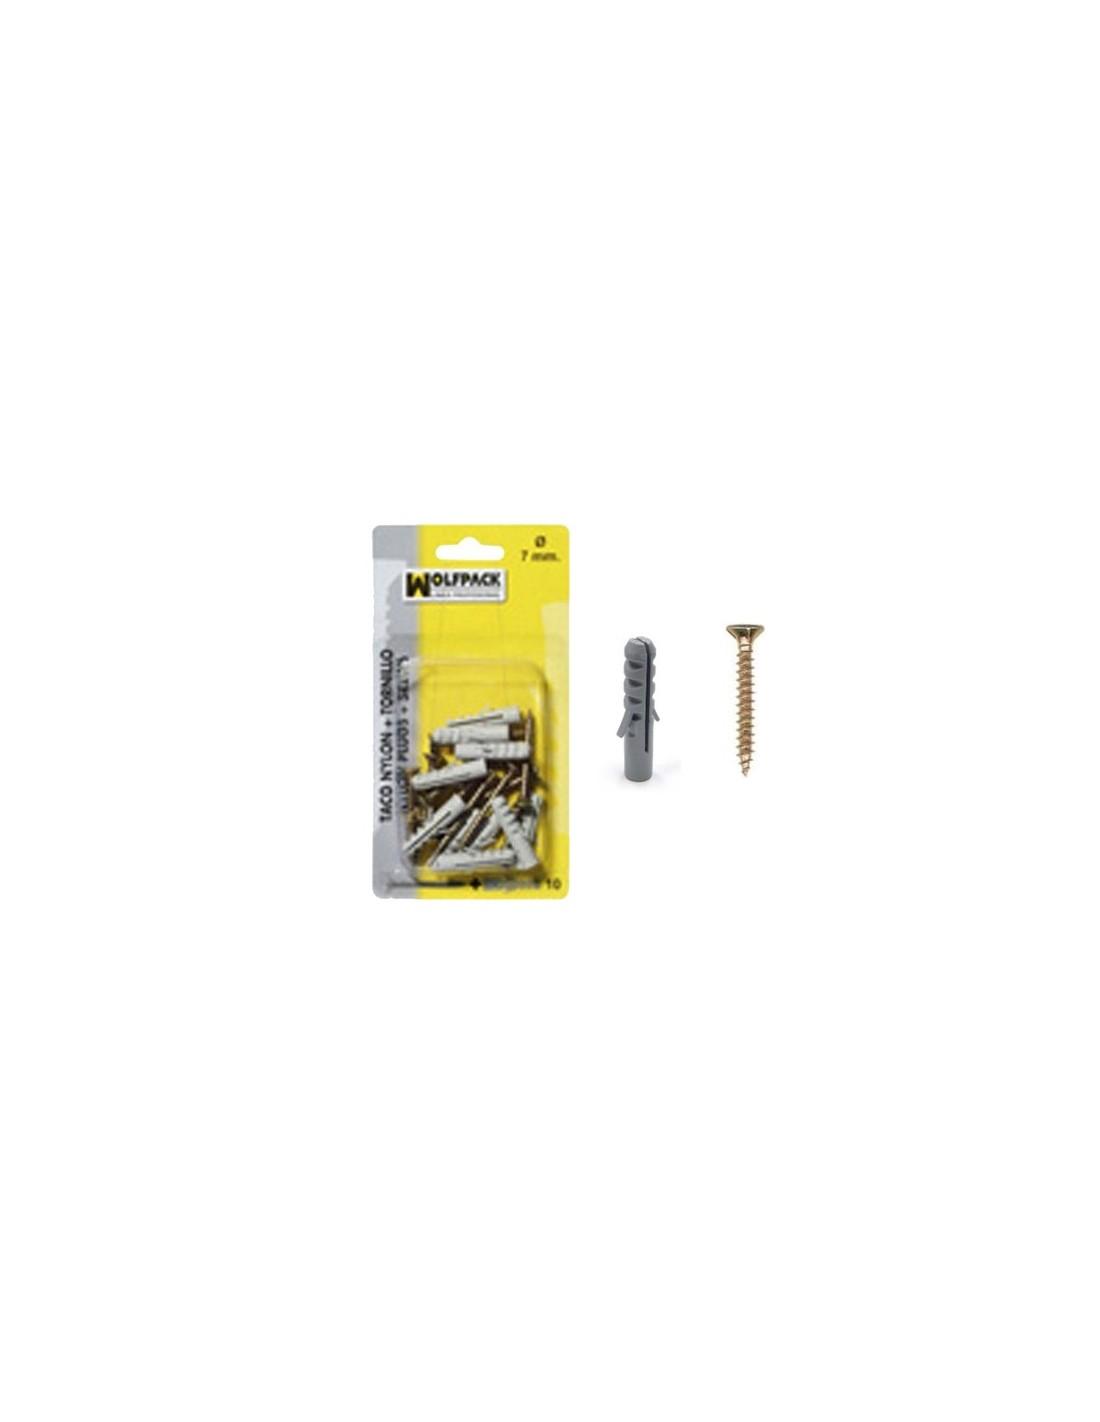 Sumidero Sifnico PVC T88 20x20 11090